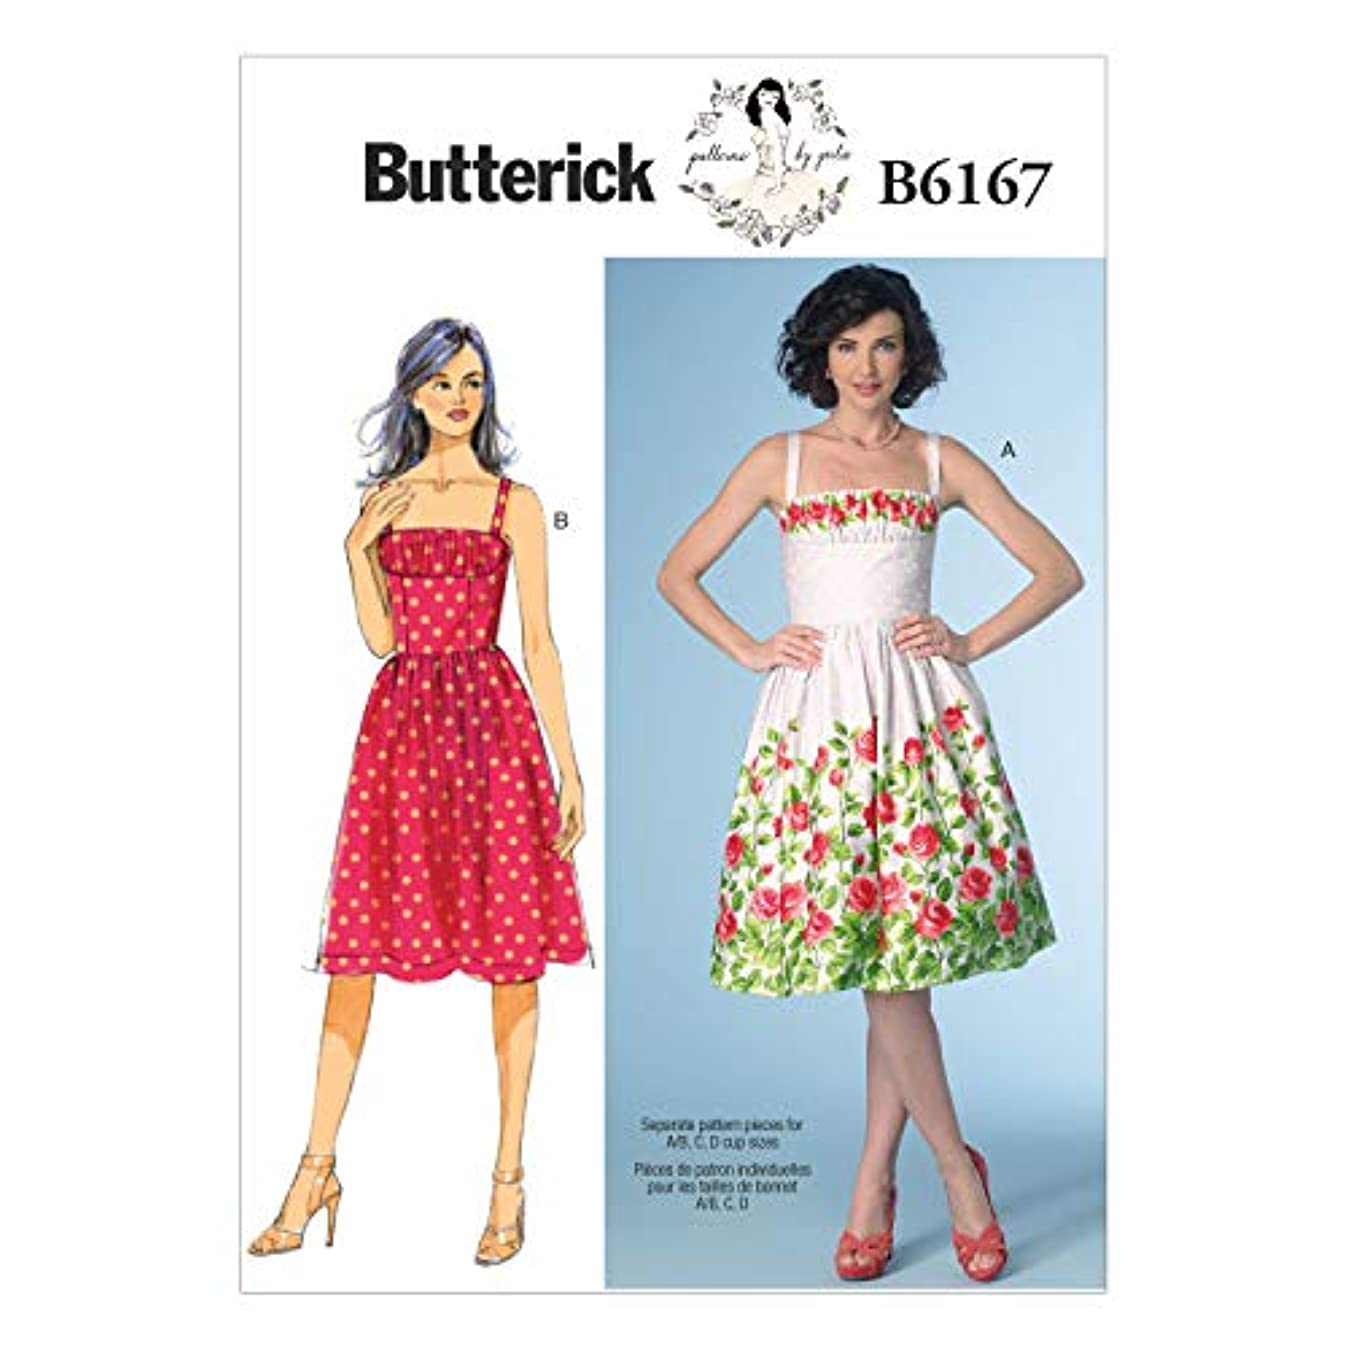 BUTTERICK PATTERNS B6167AX5 Misses' Dress Sewing Template, A5 (6-8-10-12-14)